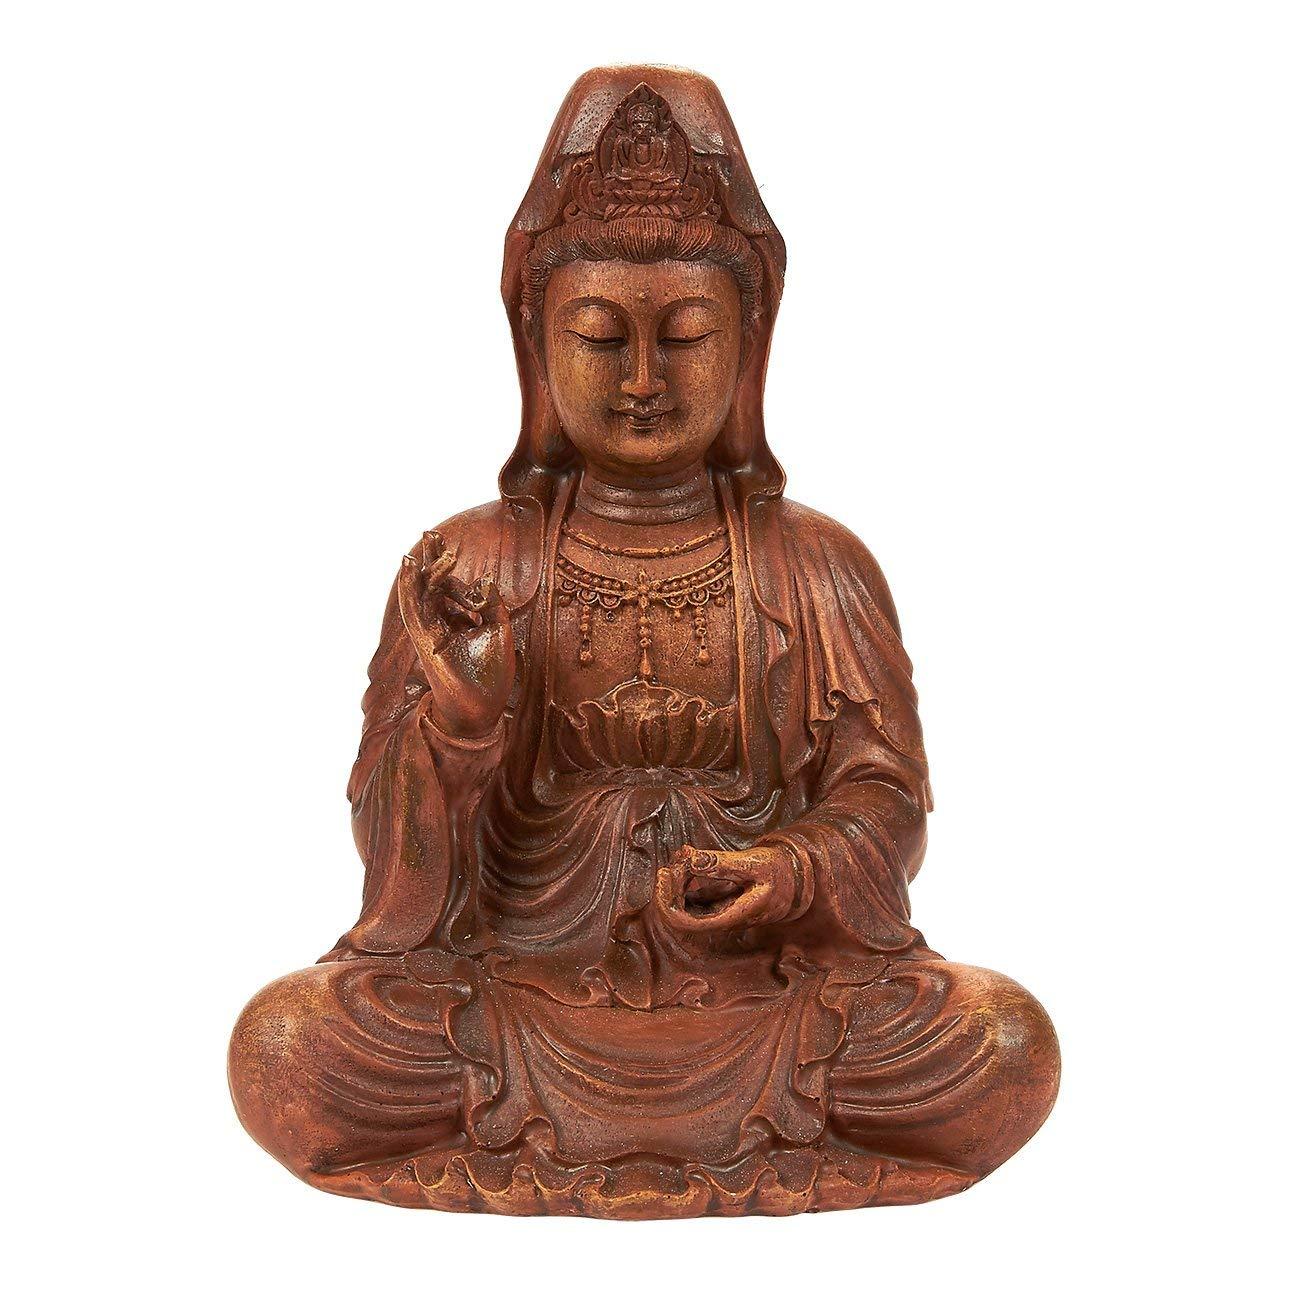 Juvale Kuan Yin Statue - Meditating Buddha Statue Guan Yin Statue Figurine, Small Buddha Statue for Interior Decoration, Good Luck Charm, Brown - 8.7 x 7 x 5.2 inches